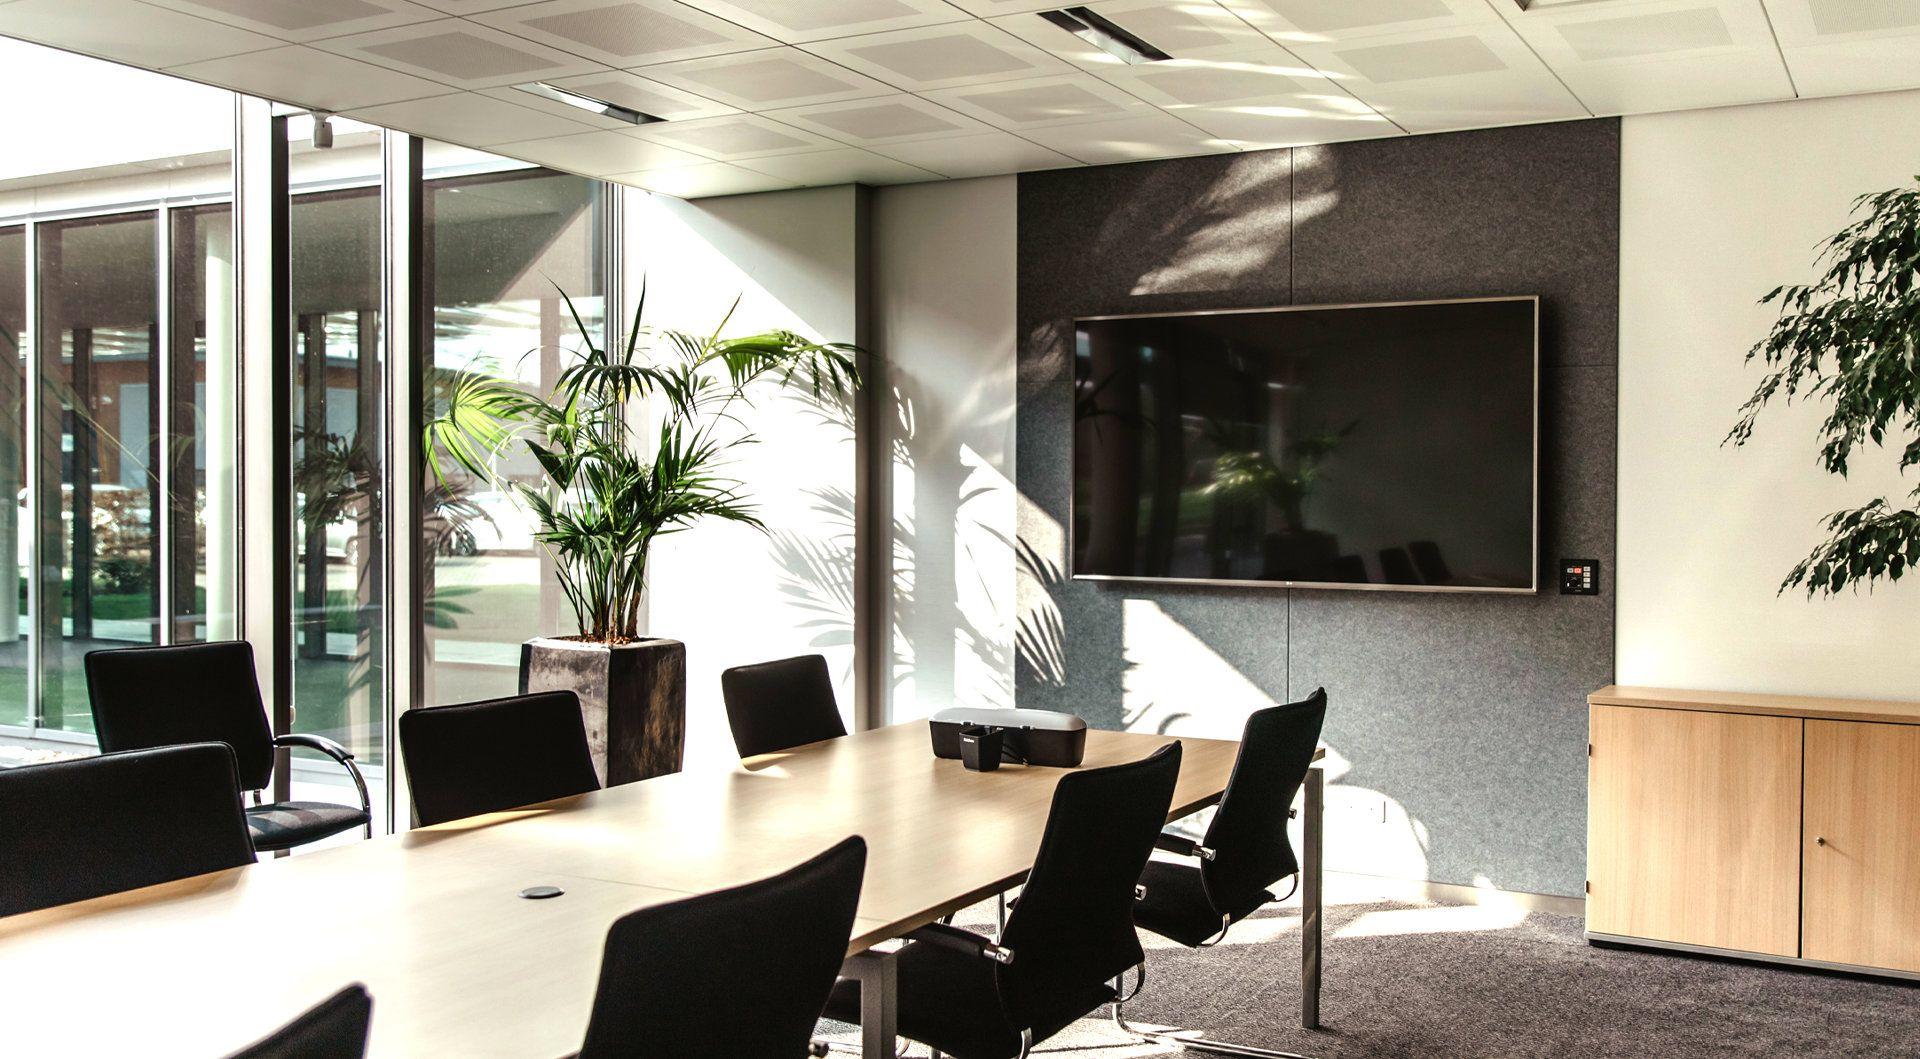 "Projecta ProCinema CSR 117 x 200 projectiescherm 2,18 m (86"") 16:9 - Case studie de vries"